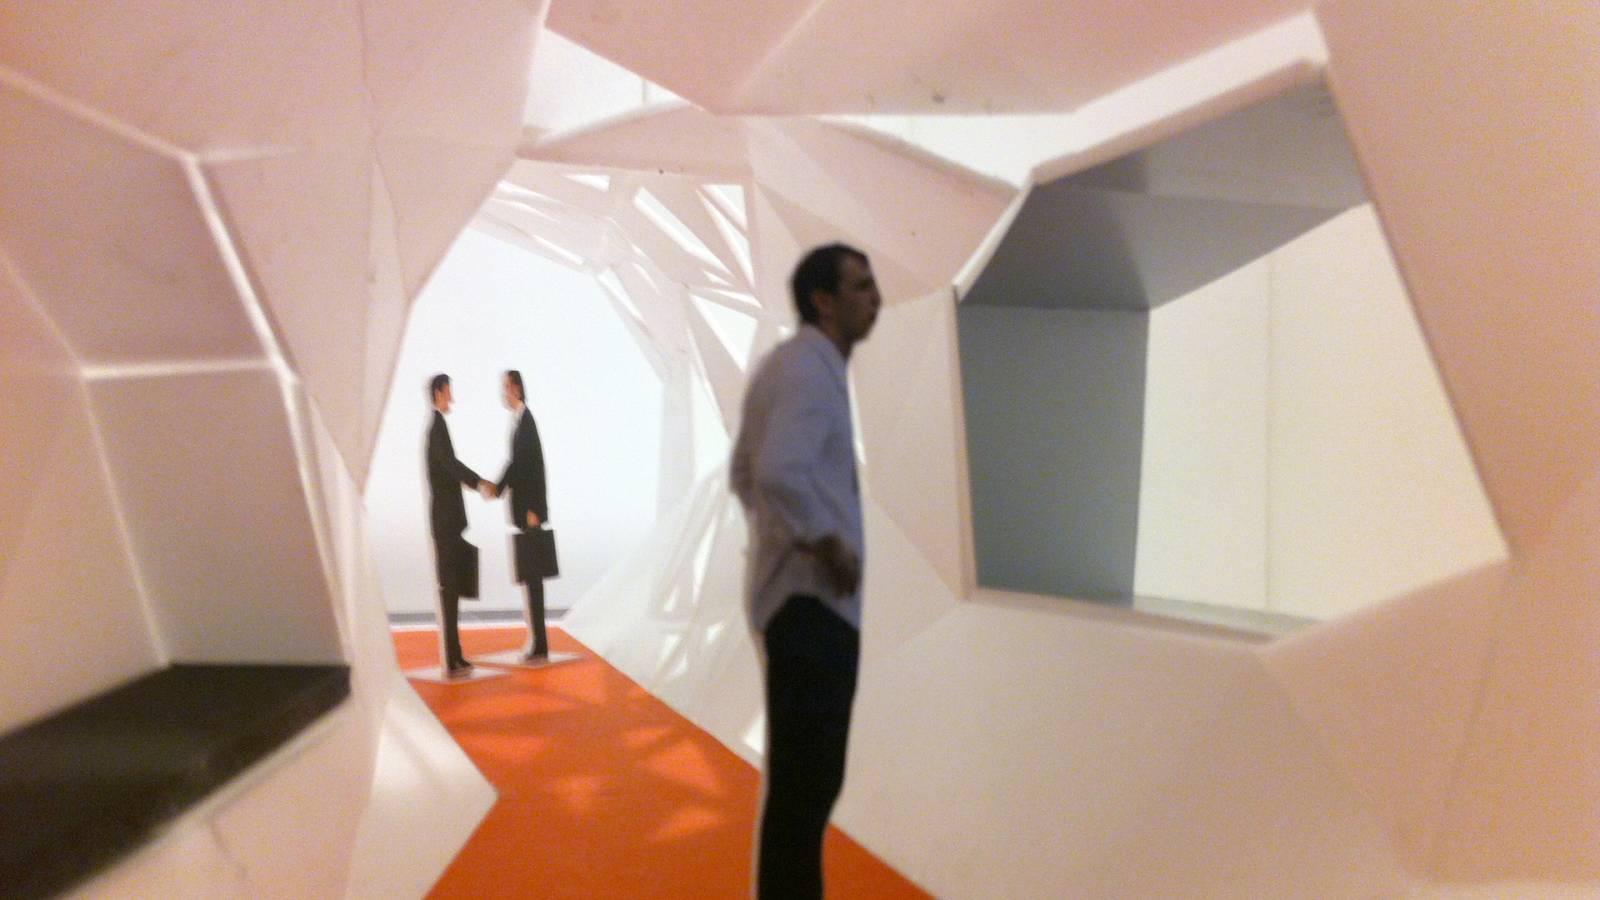 CORRIDOR VIEW - Zeppelin Films - SPOL Architects